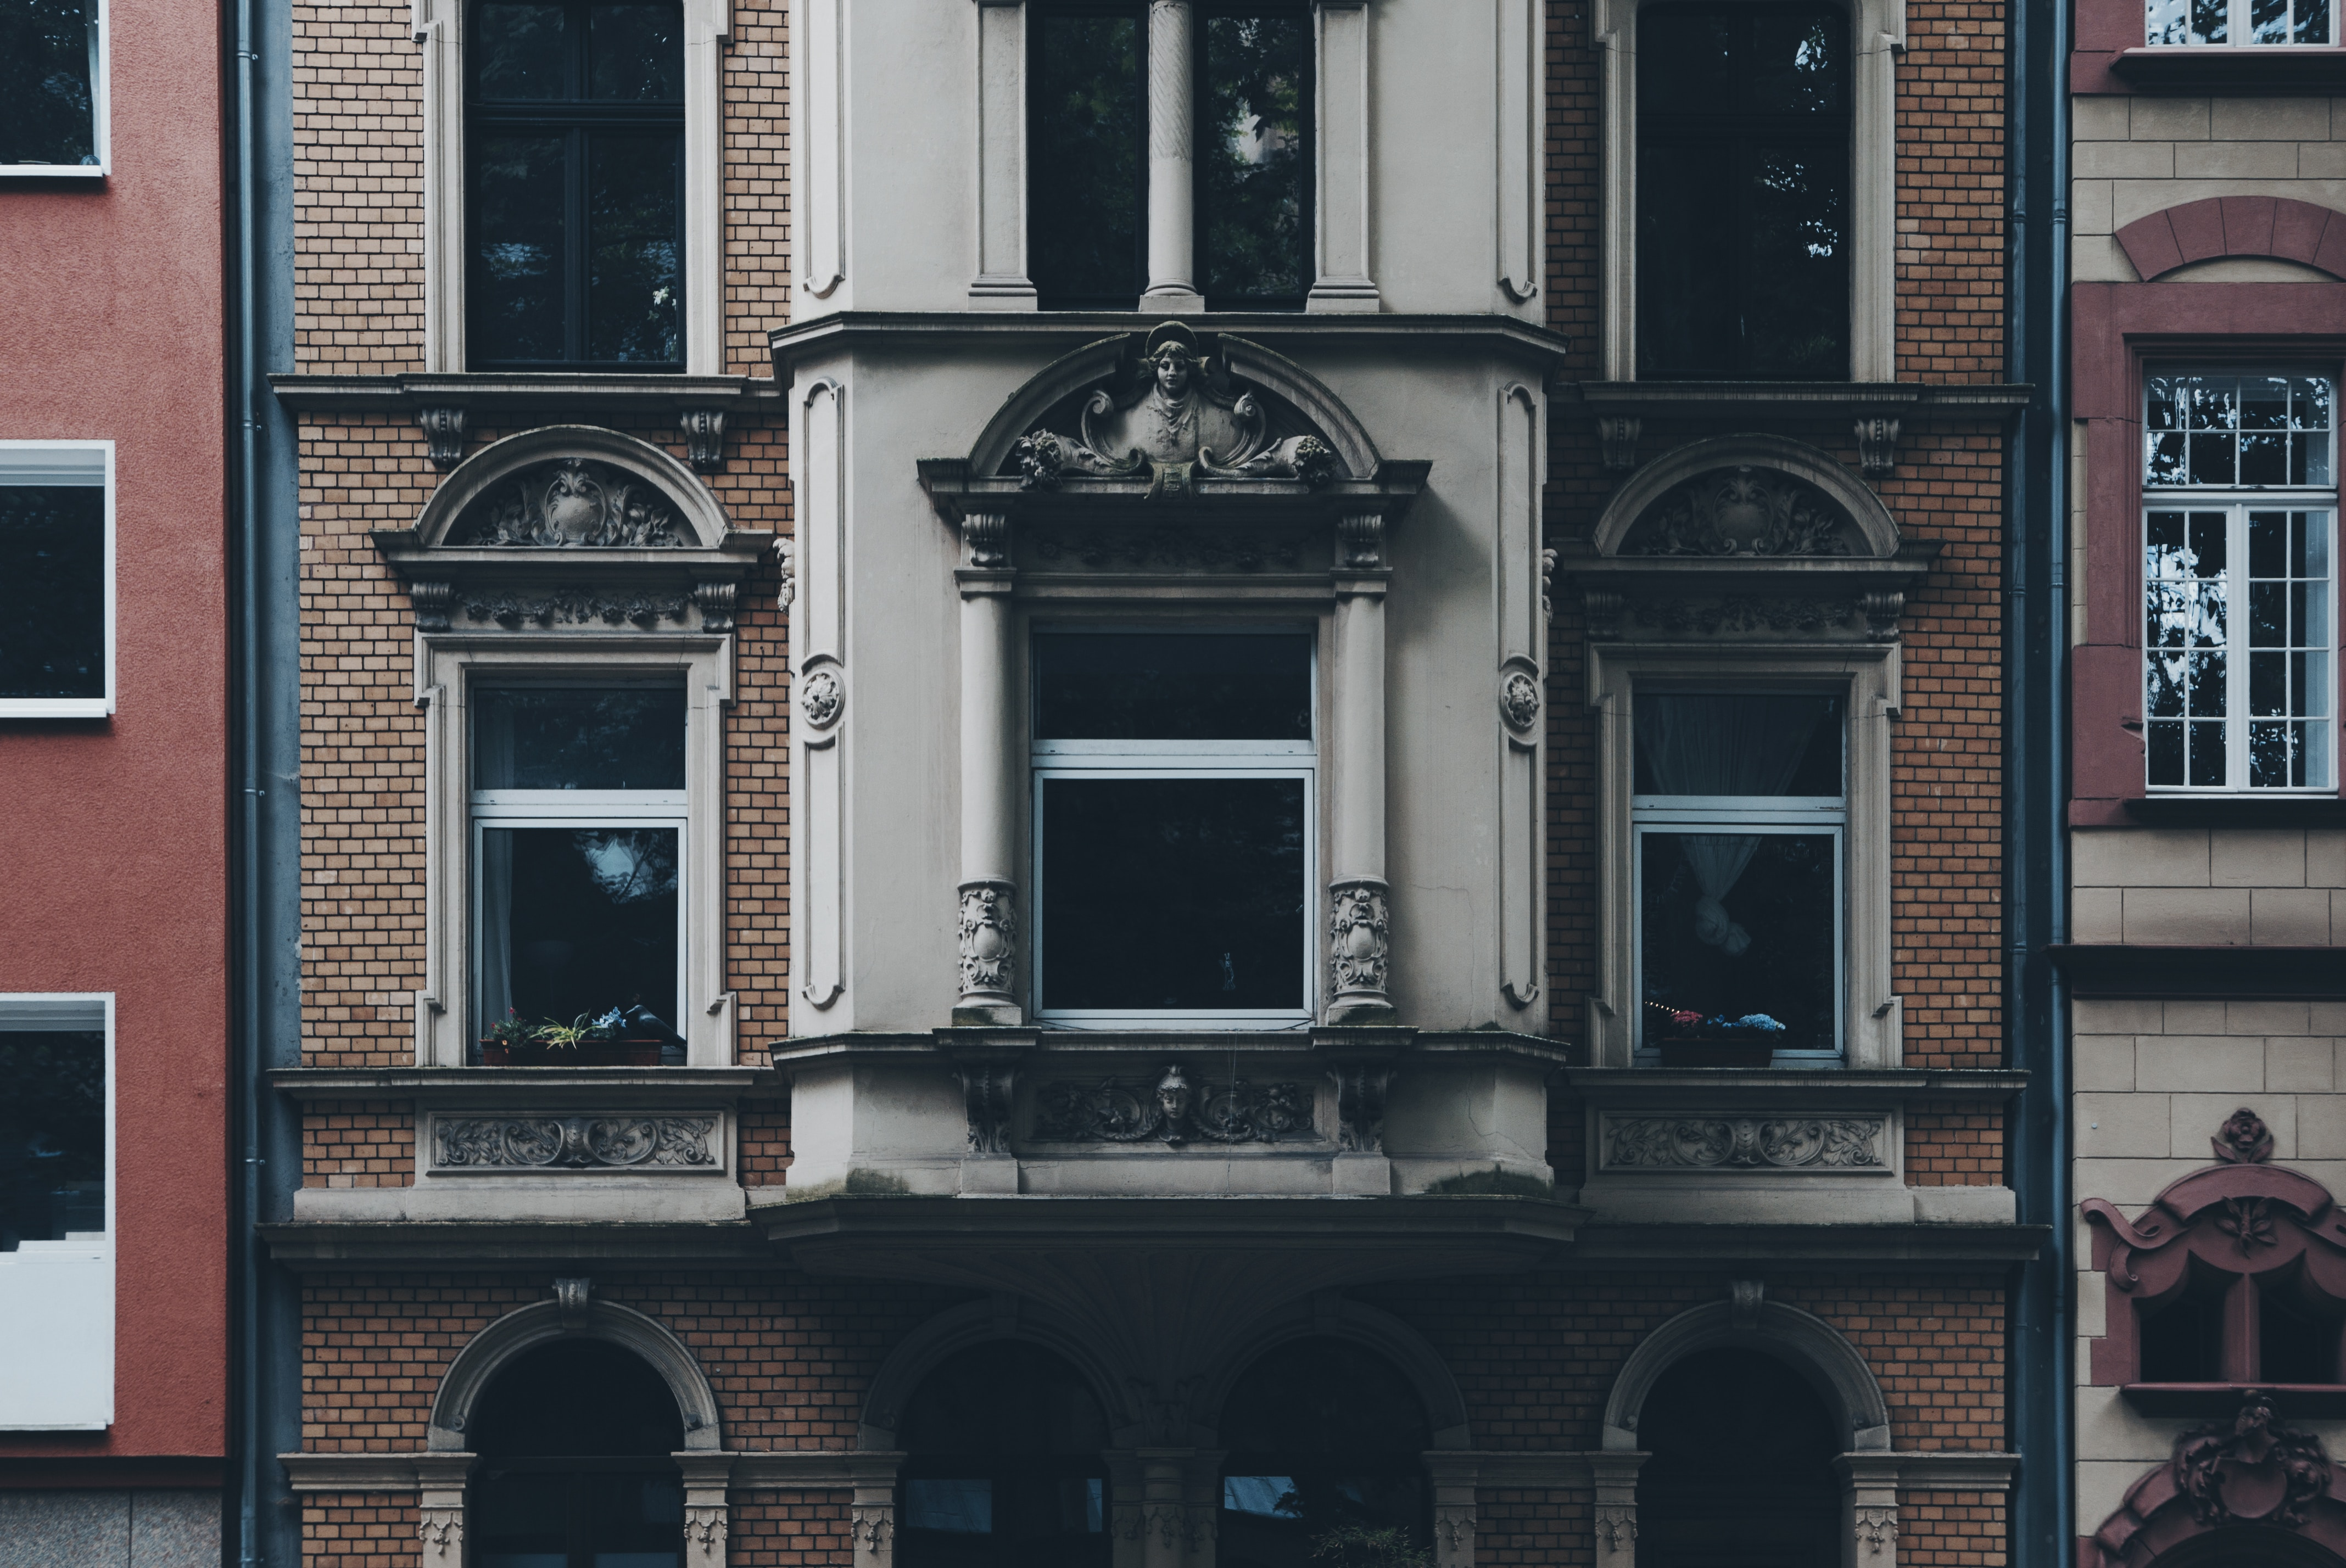 Liste der besten Immobilienmakler in Karlsruhe